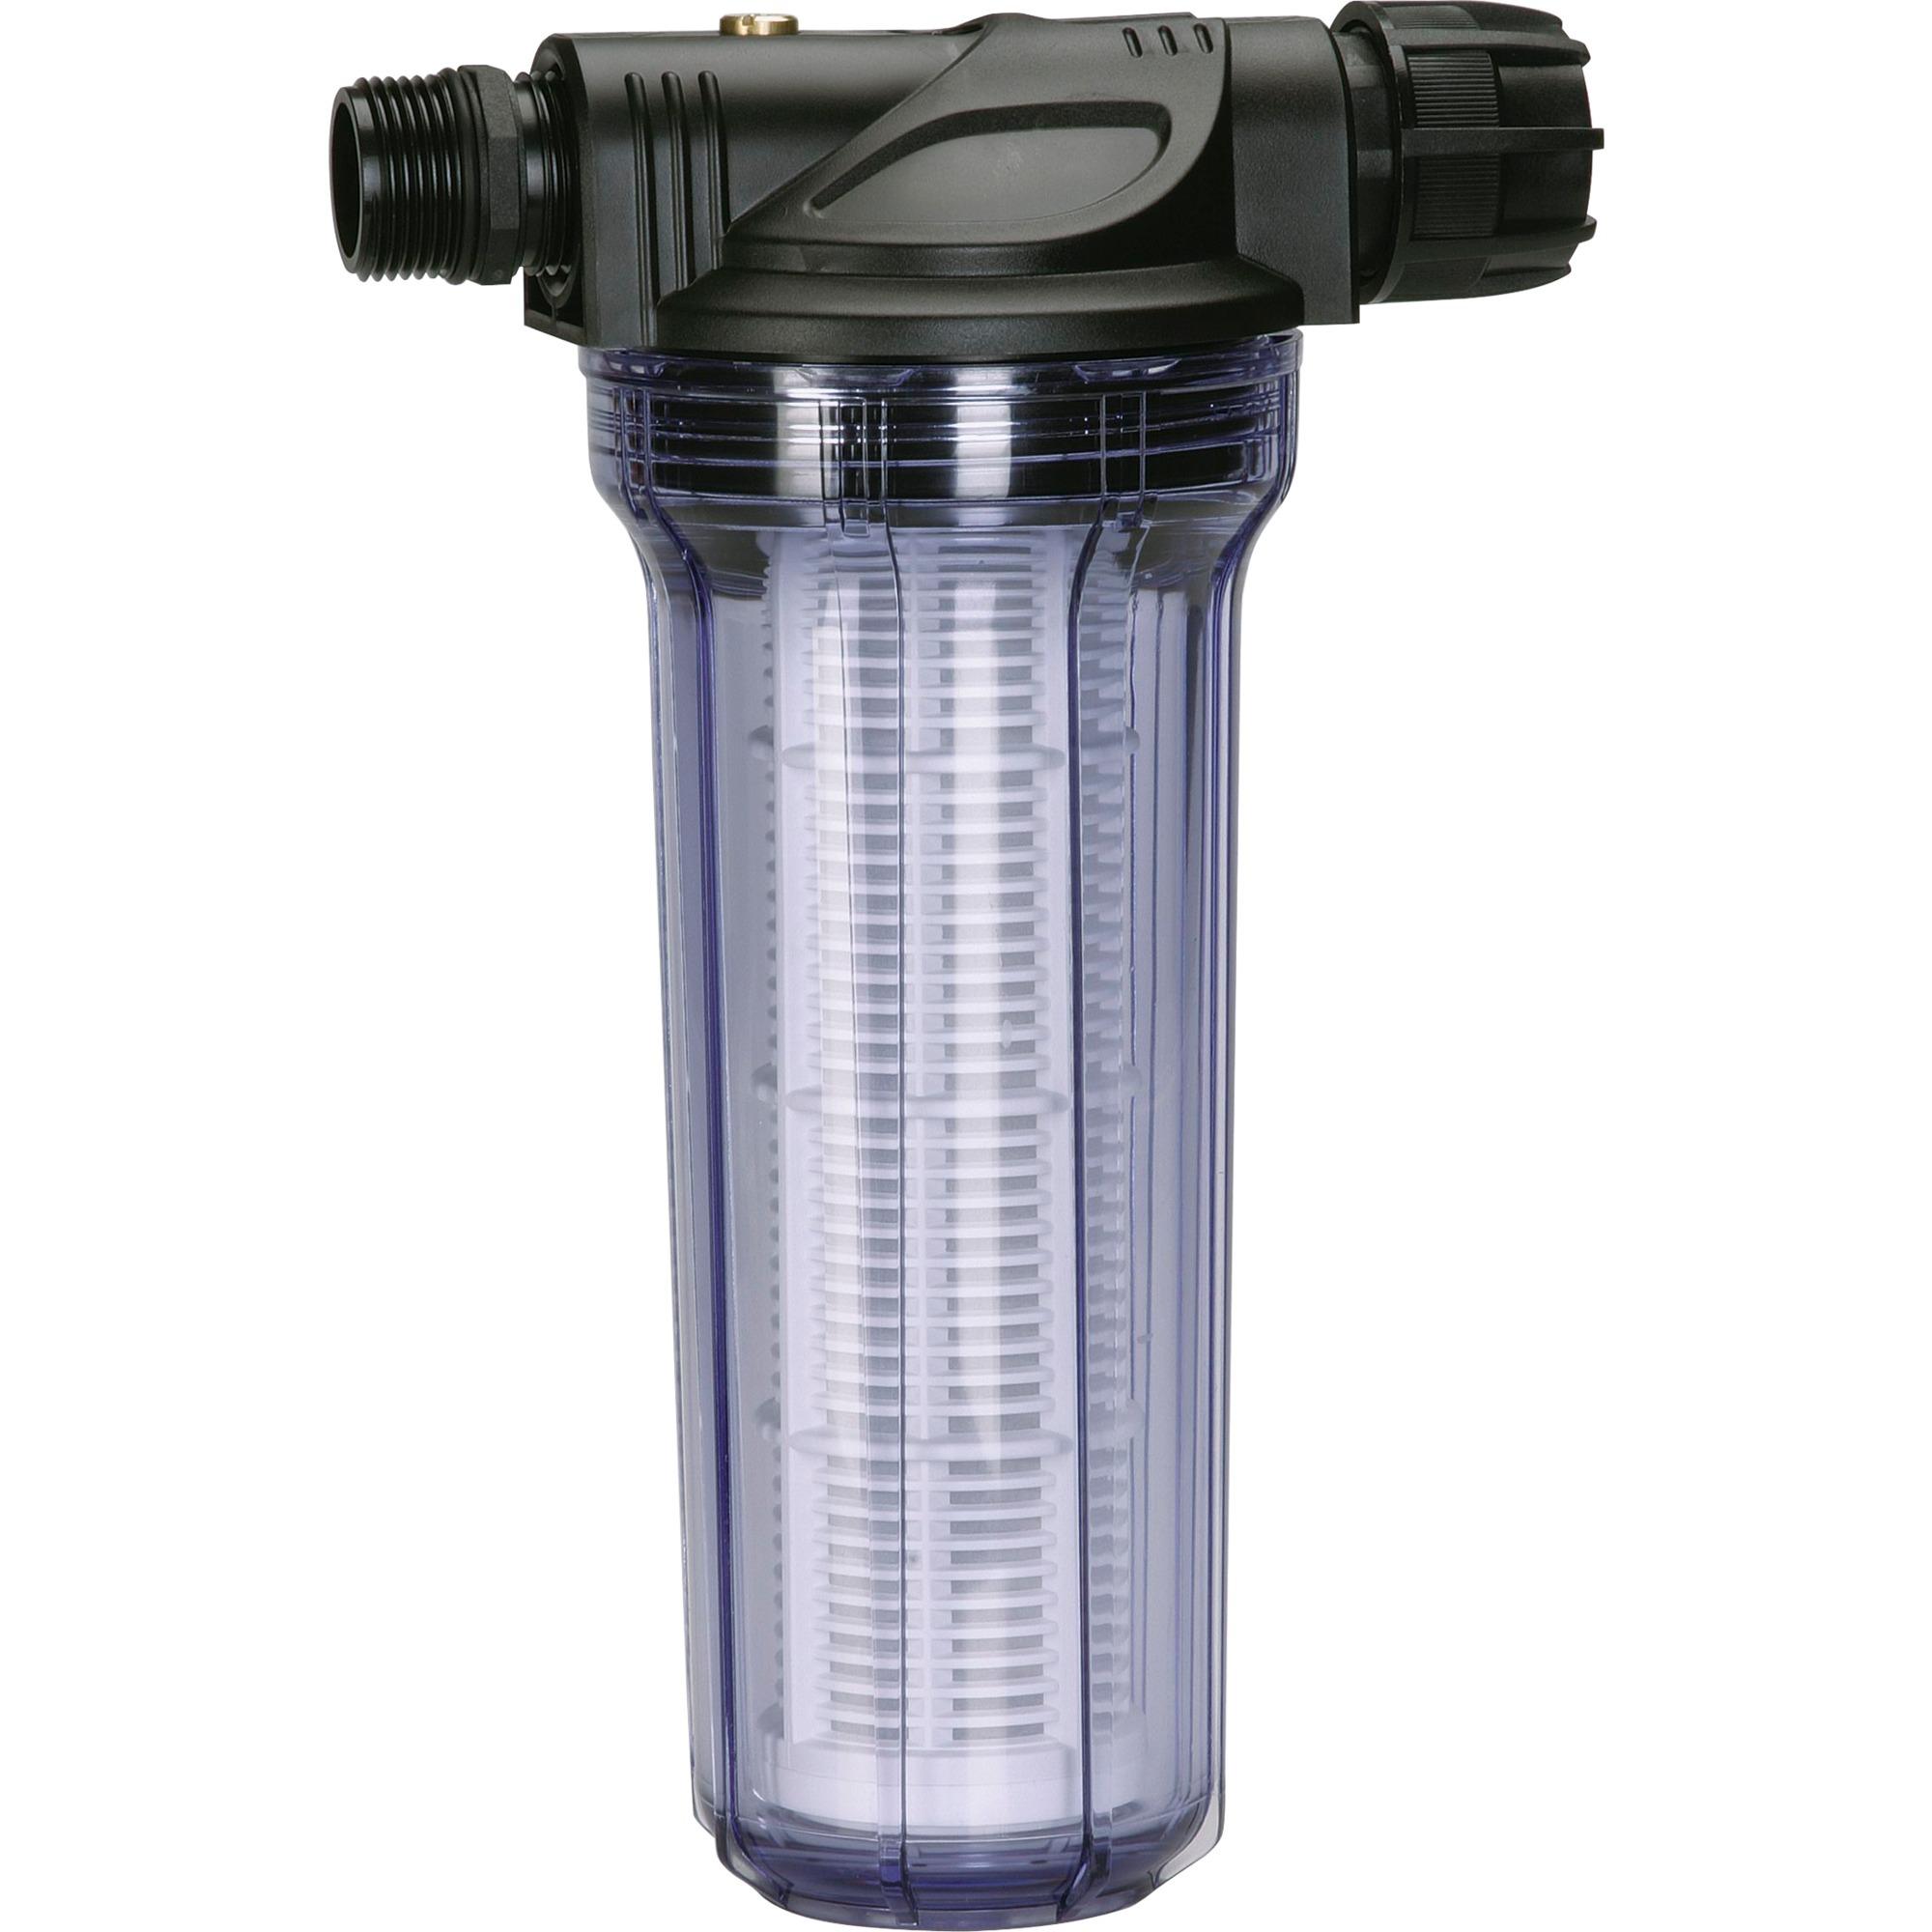 Oferta filtros membrana osmosis inversa compatible puremax - Filtros de osmosis inversa precios ...